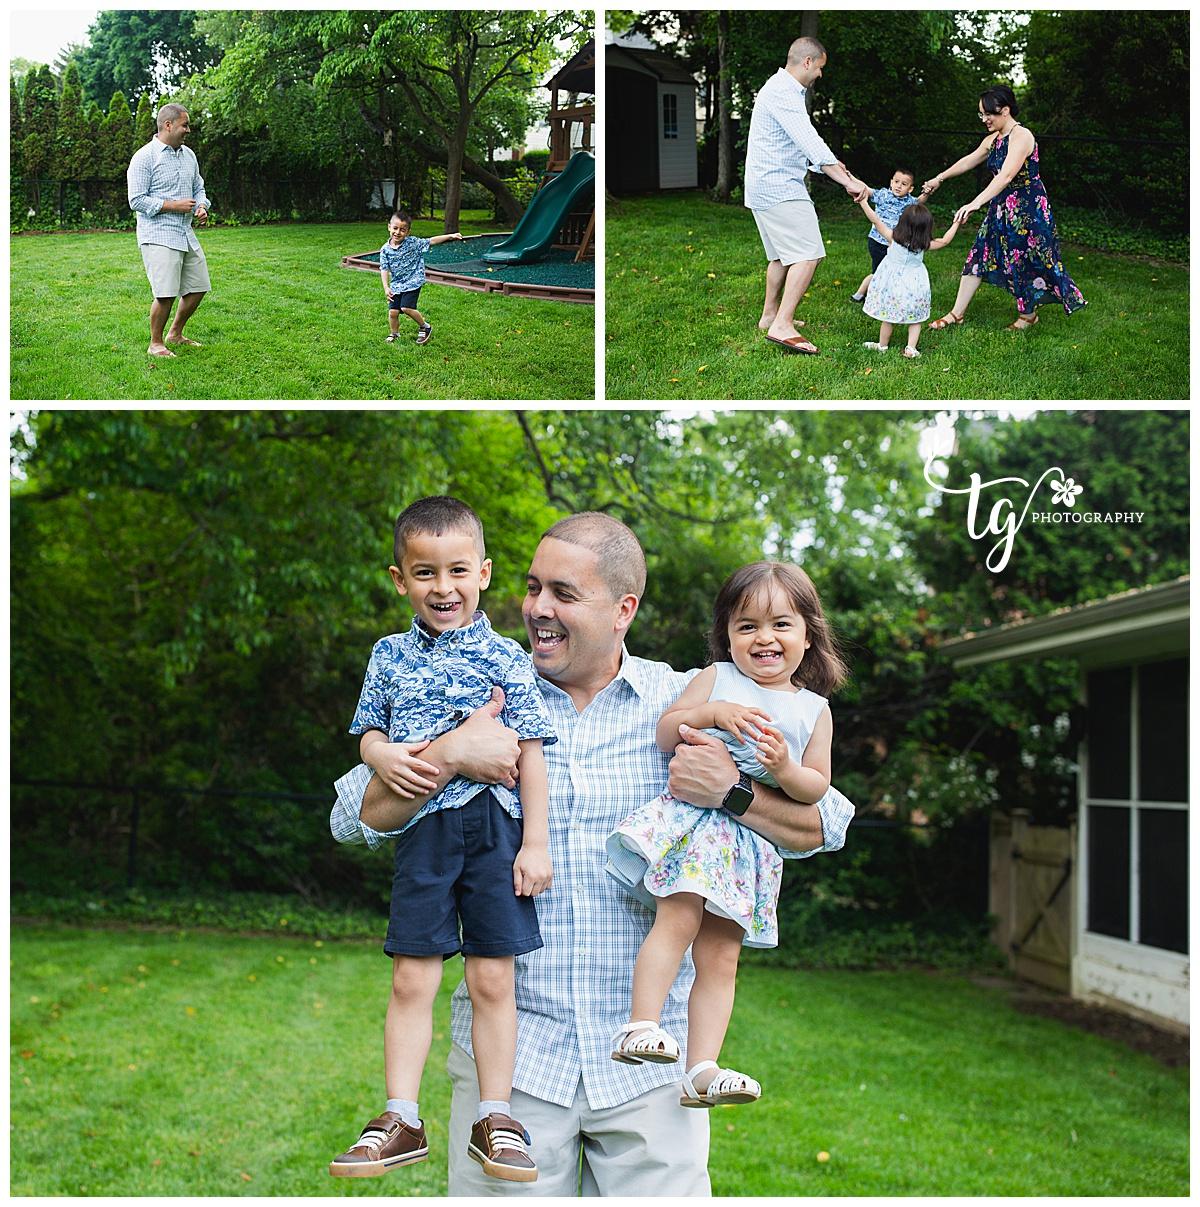 backyard family photo session